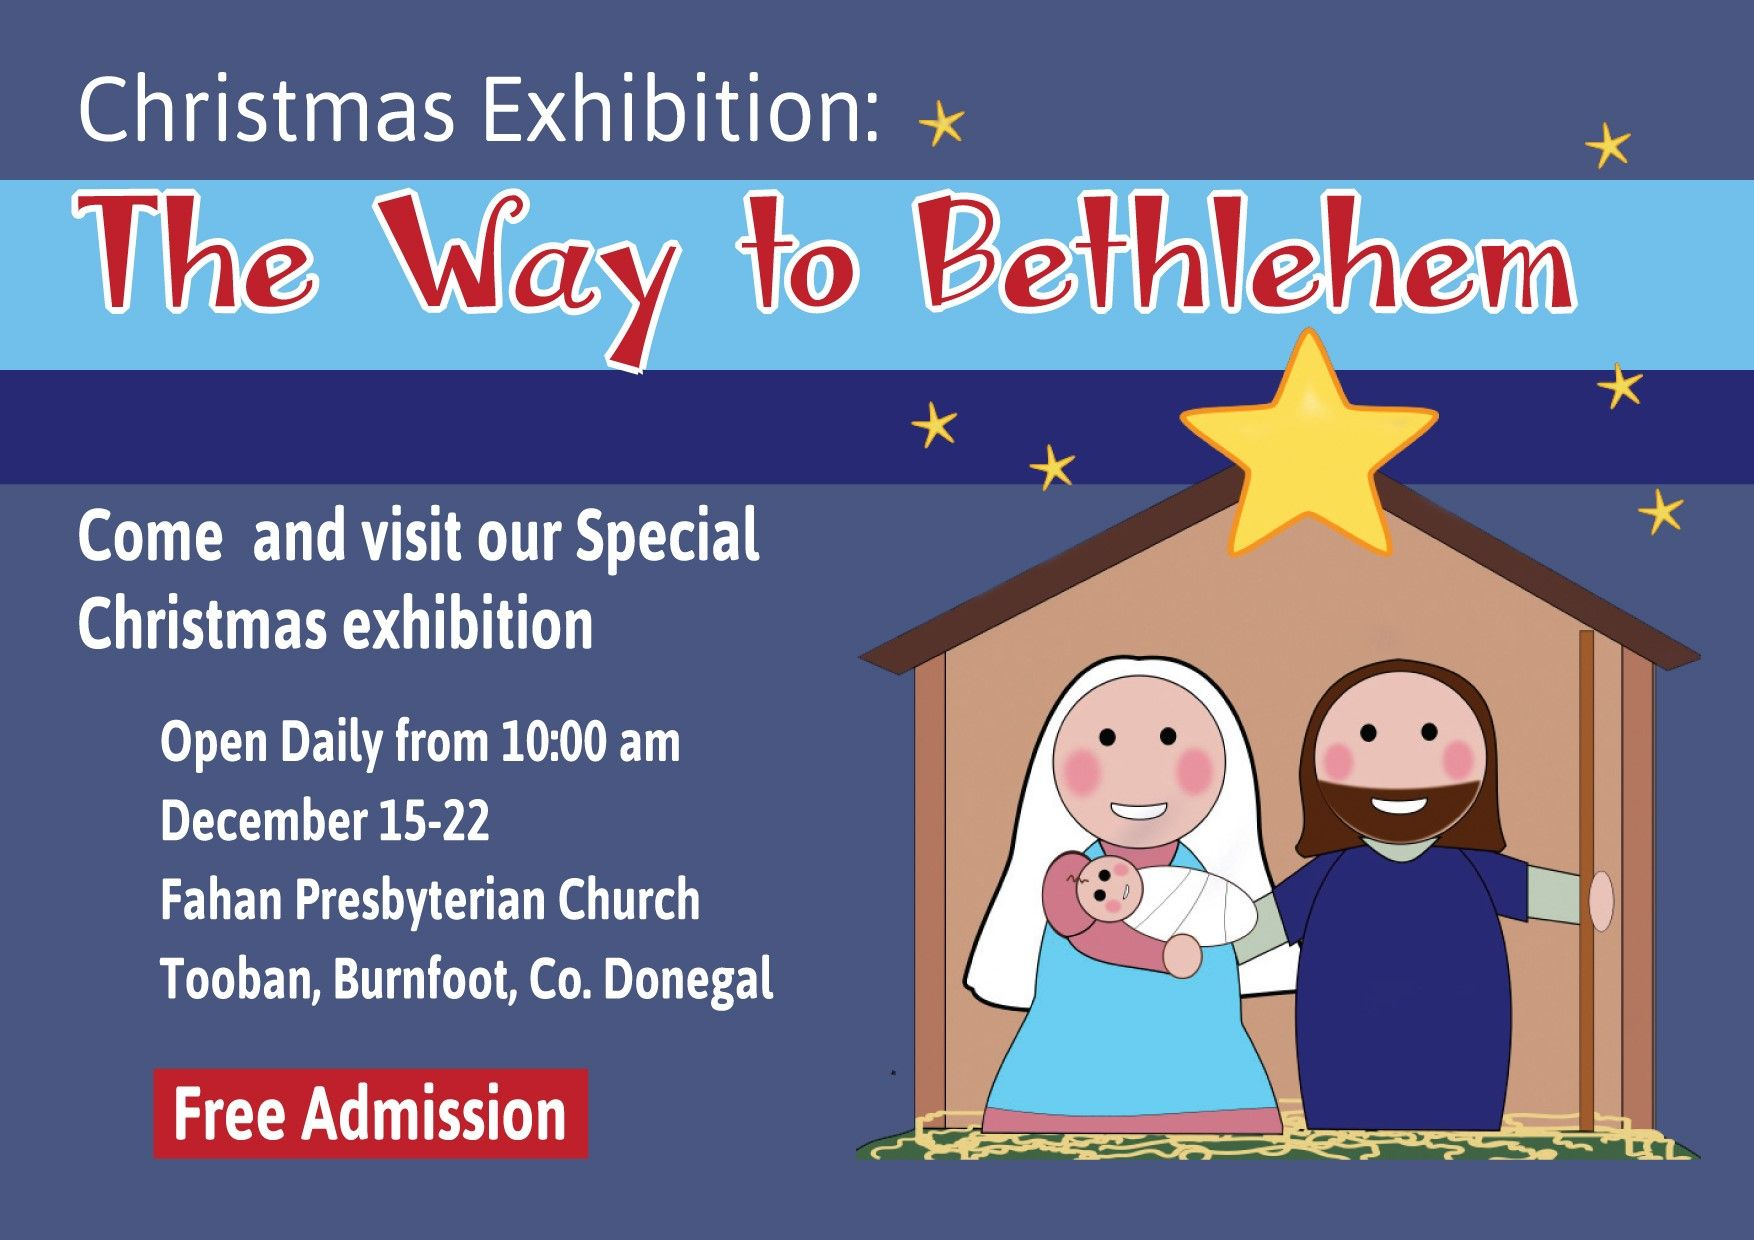 The Way to Bethlehem